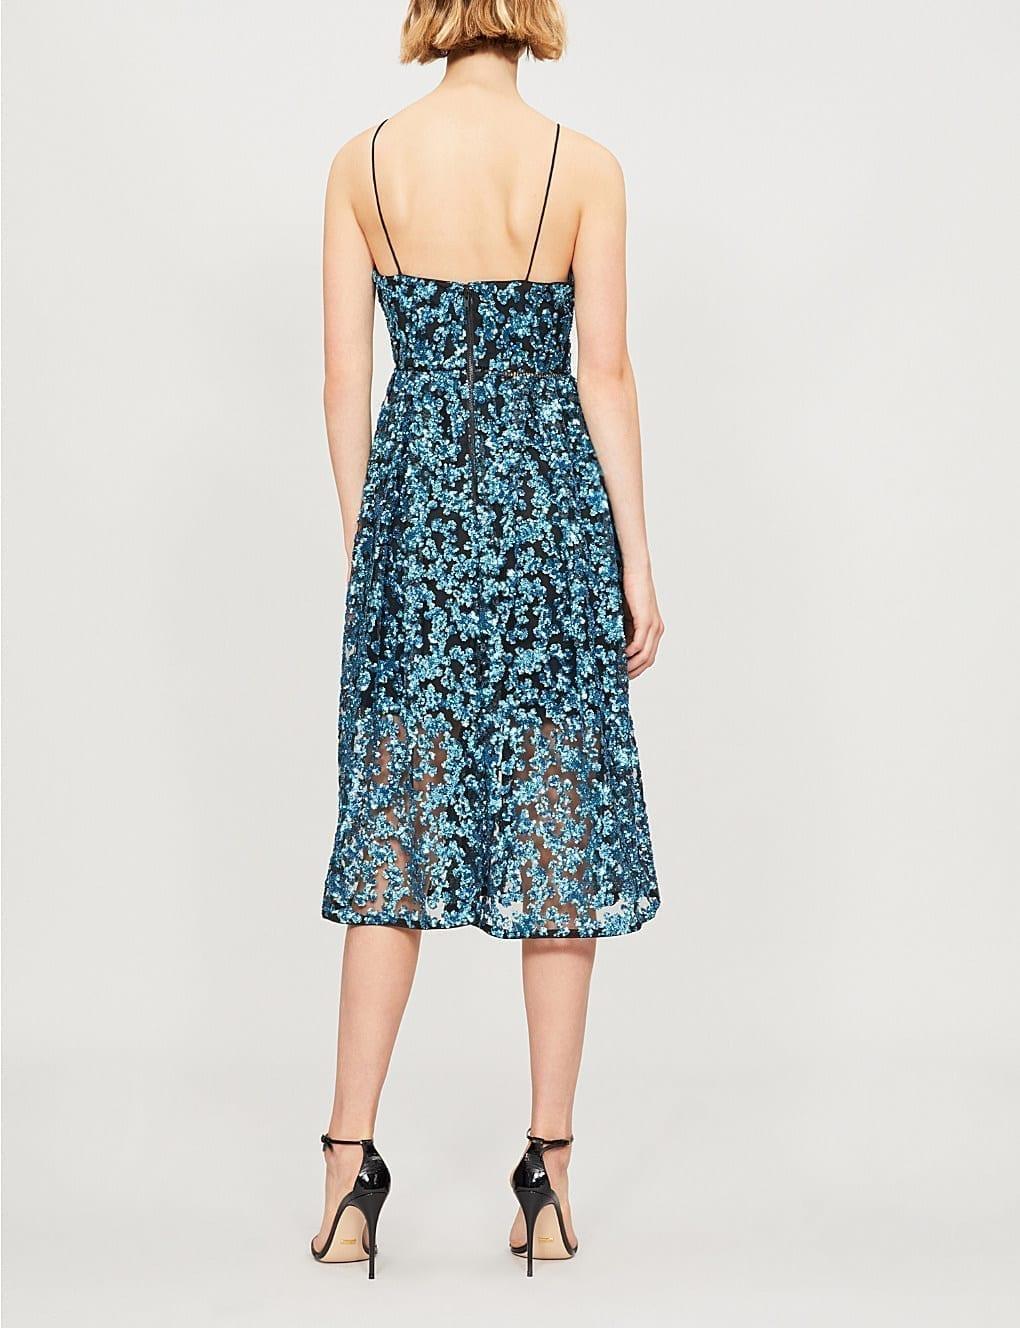 573bbfac98d3 SELF-PORTRAIT Sequin Azaelea Midi Blue Dress - We Select Dresses